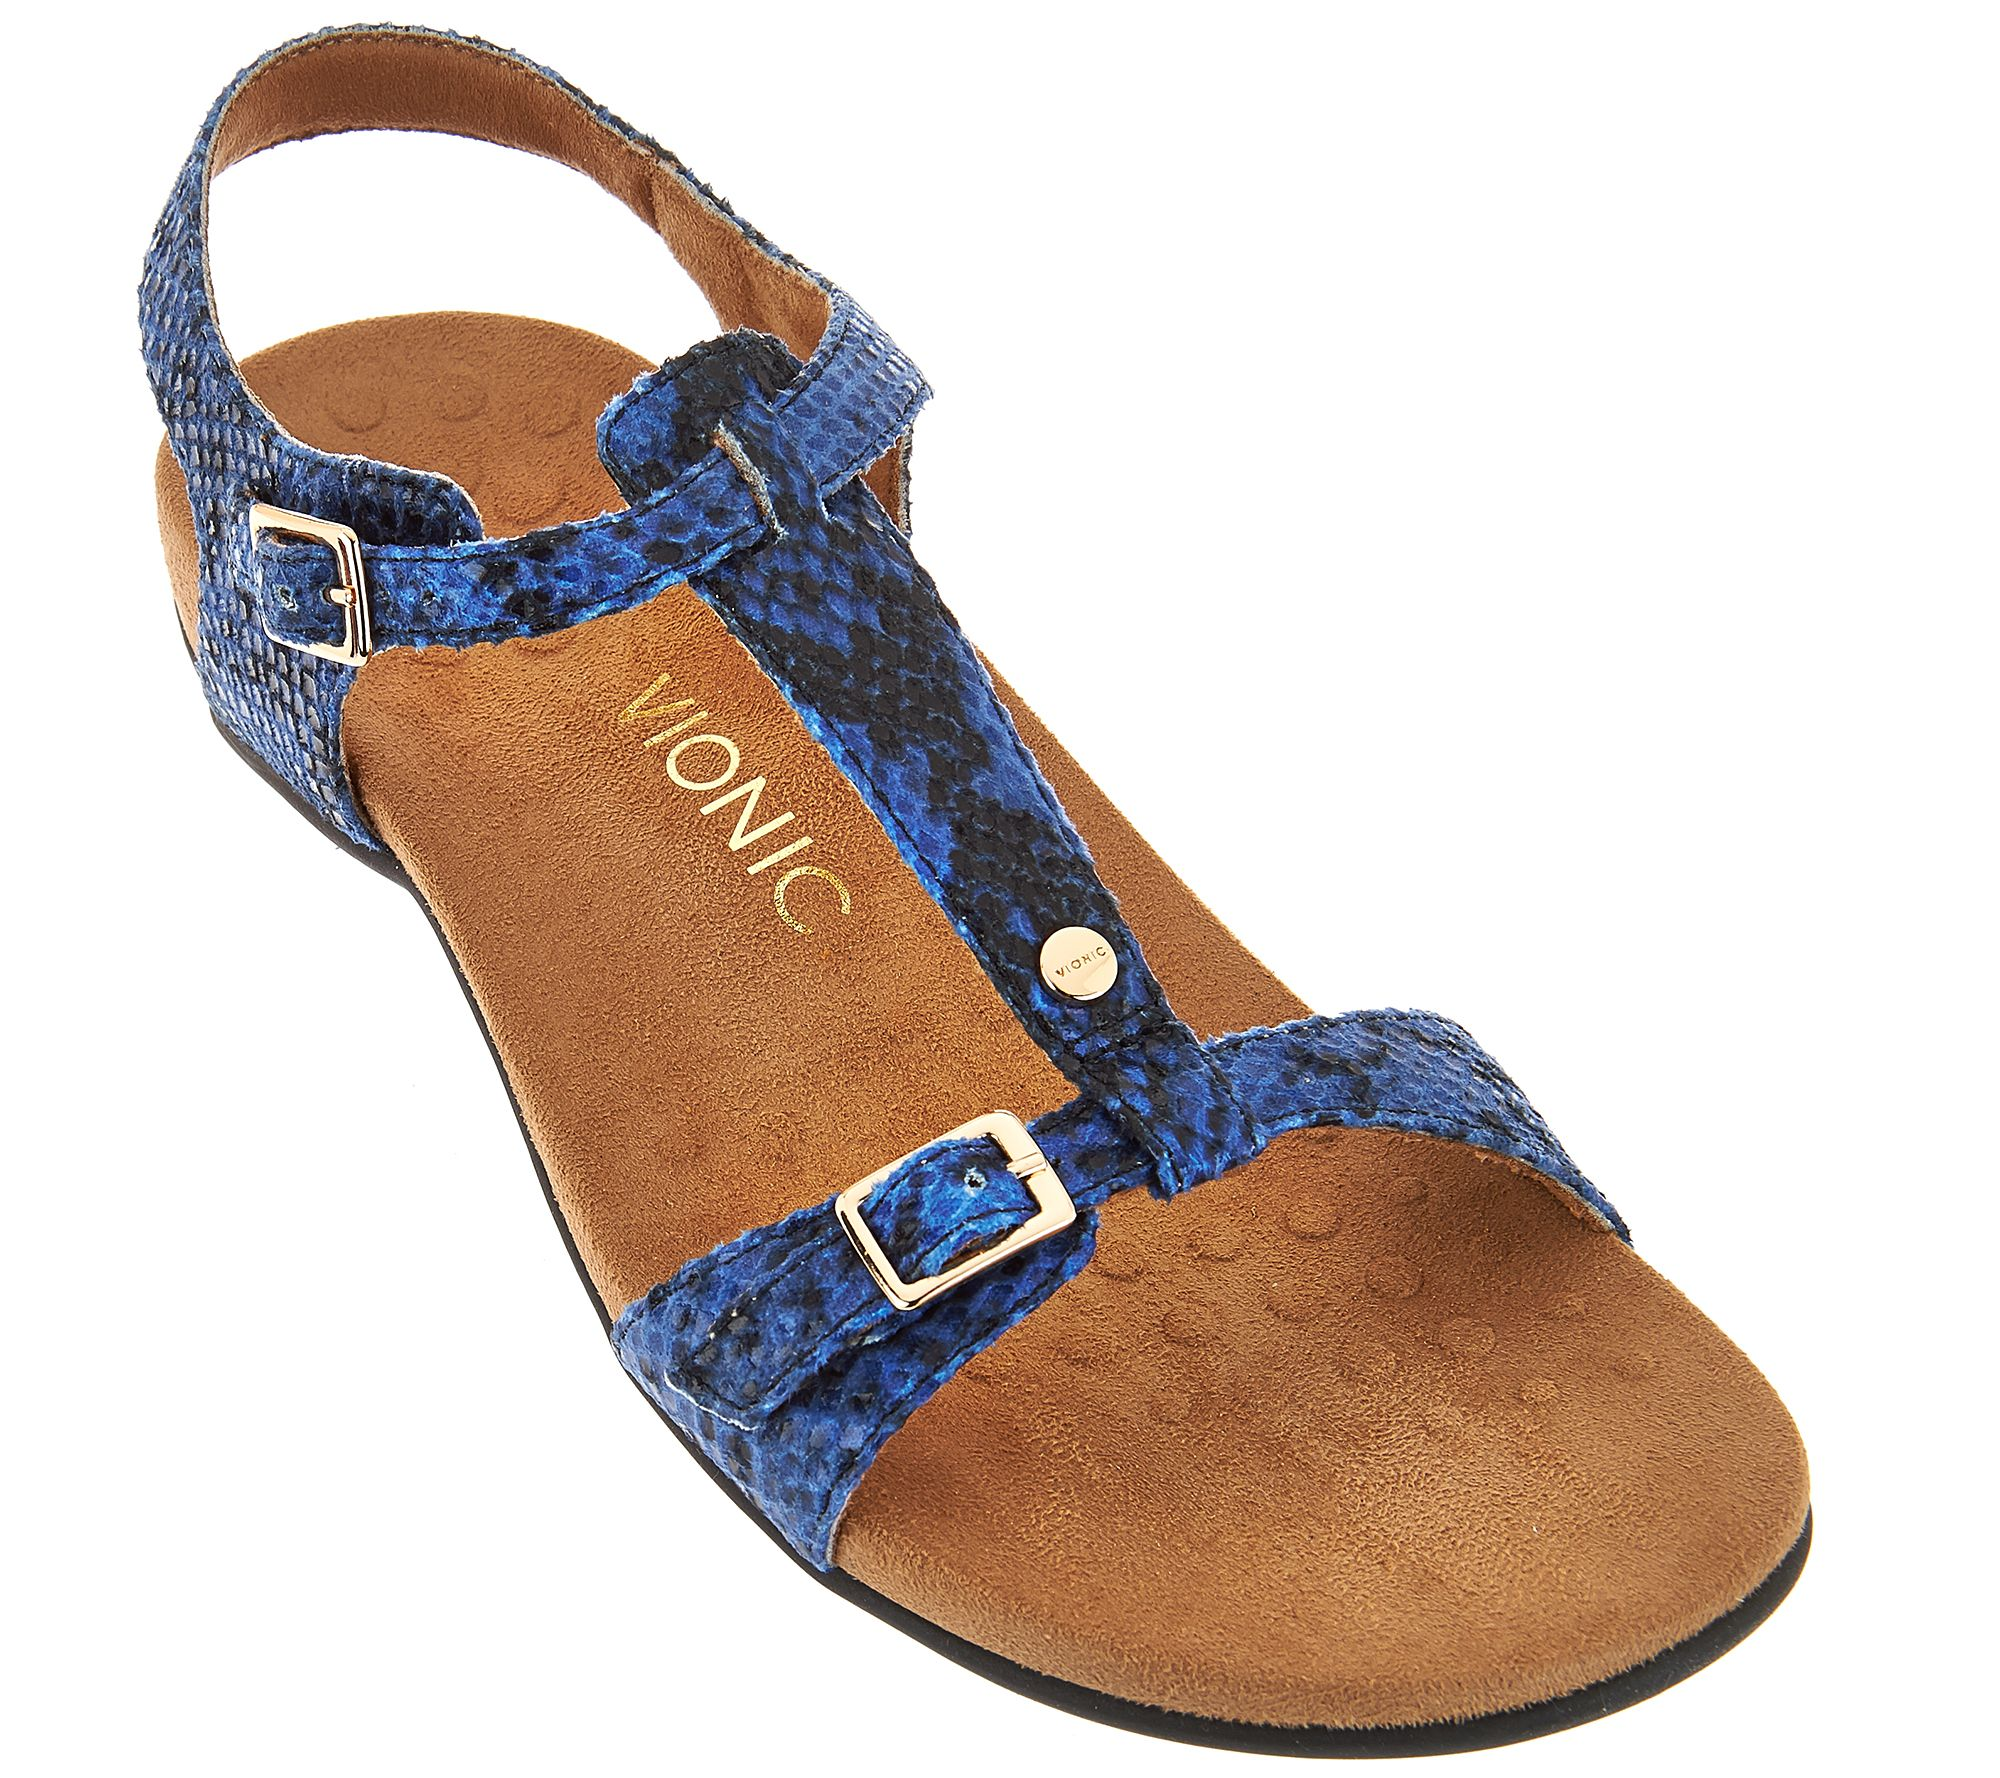 edad845a63f5e Vionic Orthotic T-Strap Sandals with Adjustable Straps - Isla - Page 1 — QVC .com